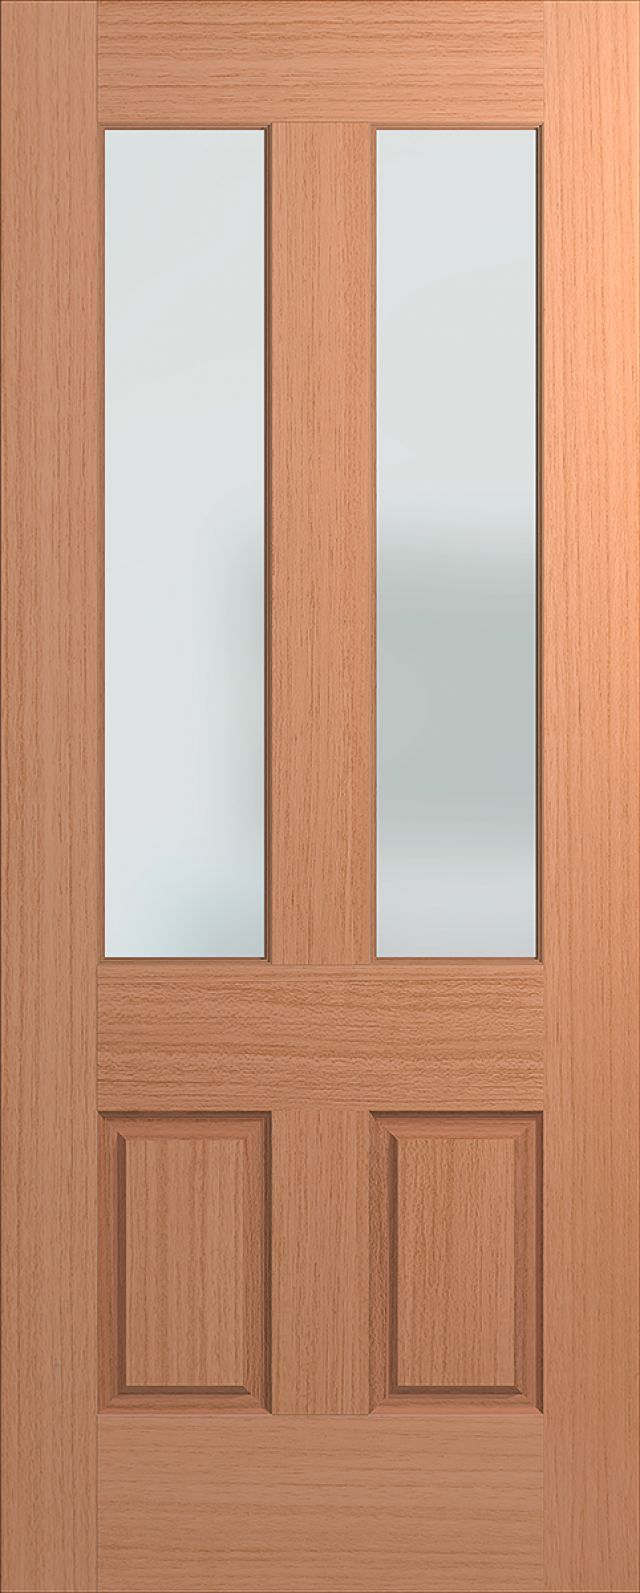 Hume doors hume doors u0026 timber 2040 x 820 x 35mm oakfield image number 11 of hume doors sandgate planetlyrics Image collections